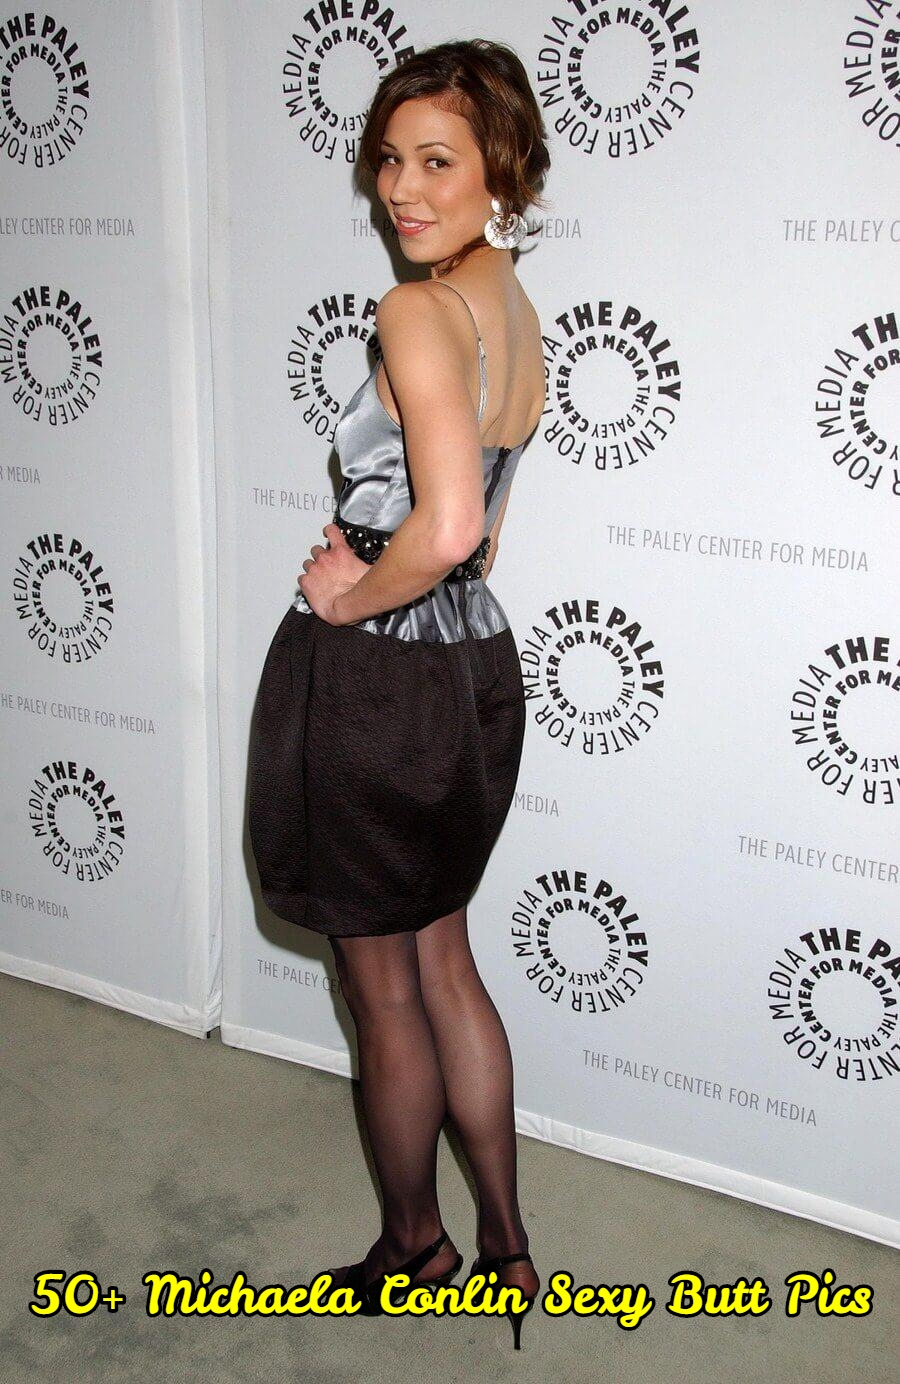 Michaela Conlin Sexy Butt Pics